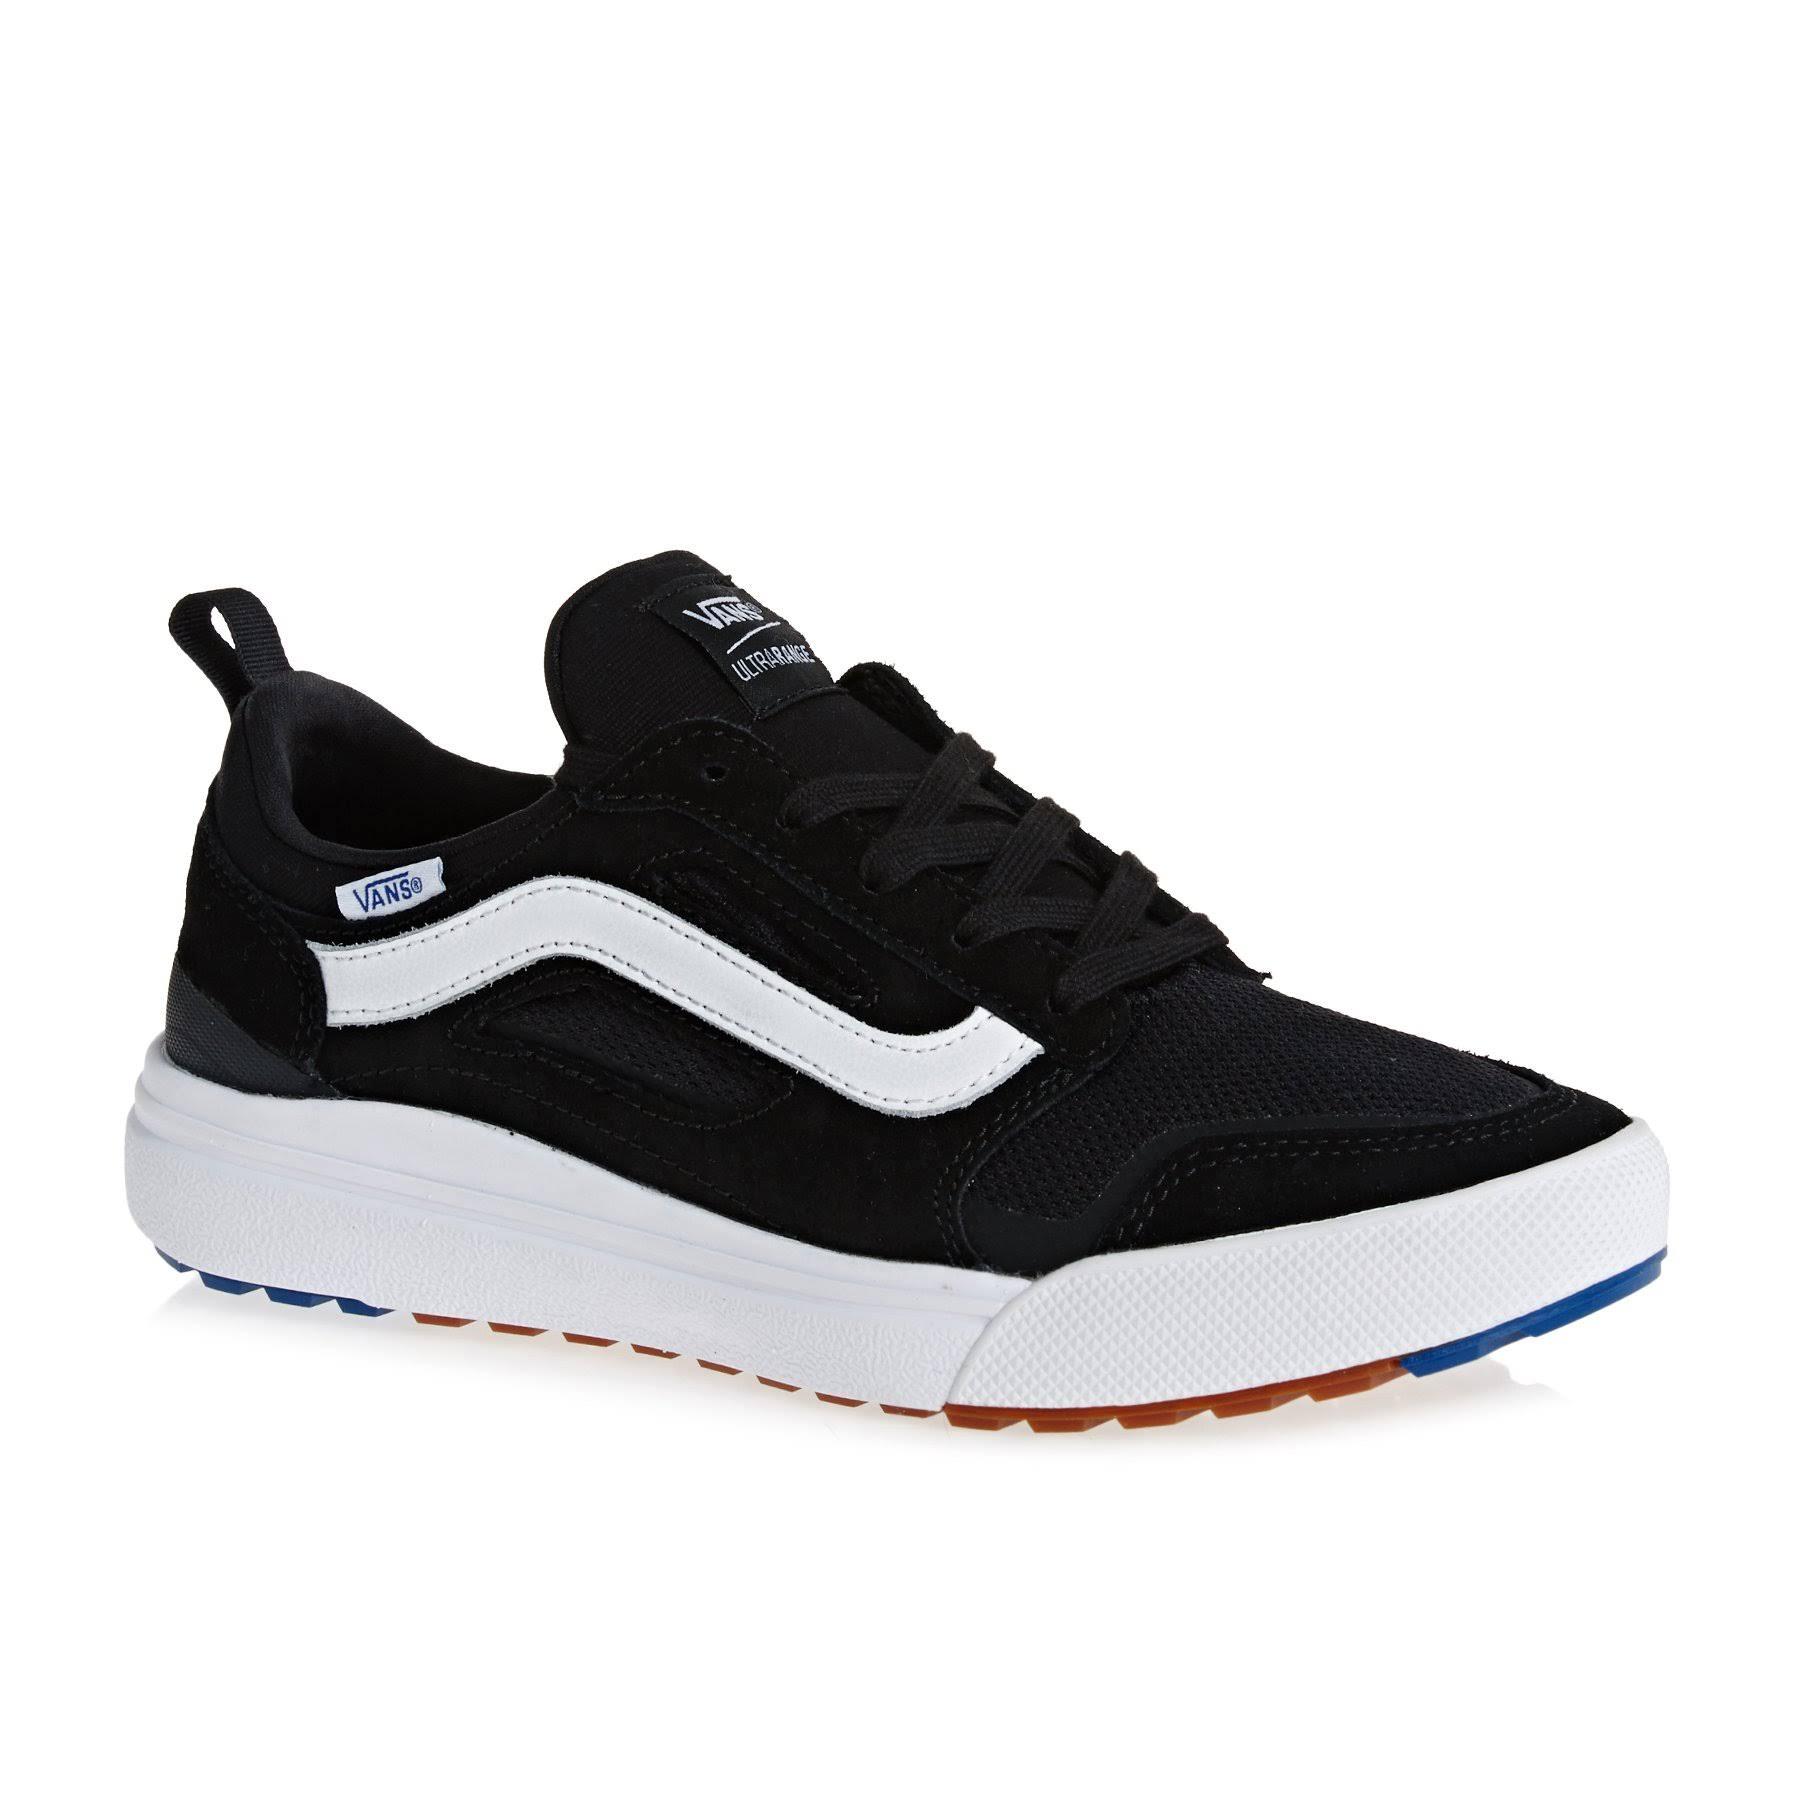 11 womens 3d 10 0 Shoe 5 white Men's Black Mens Ultrarange Vans vnxfw5qgzv